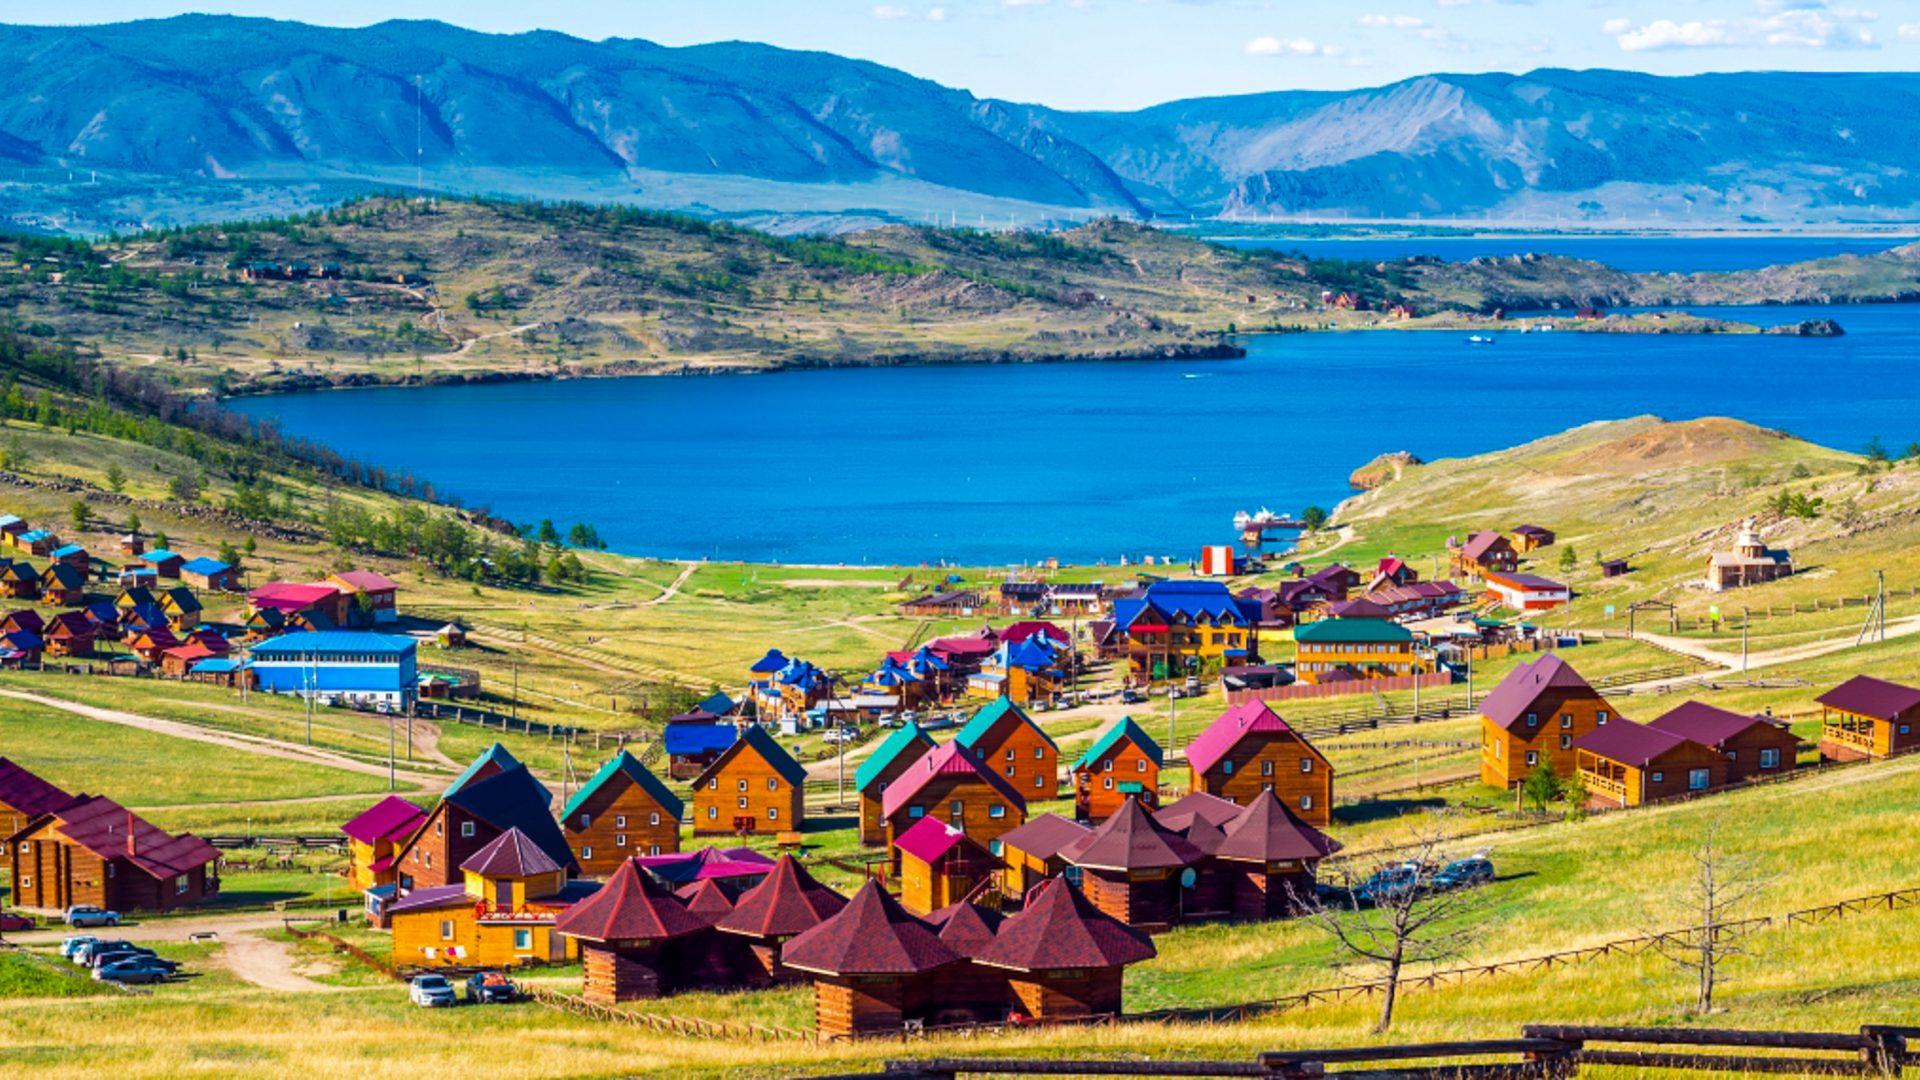 Ziua 11: Baikal